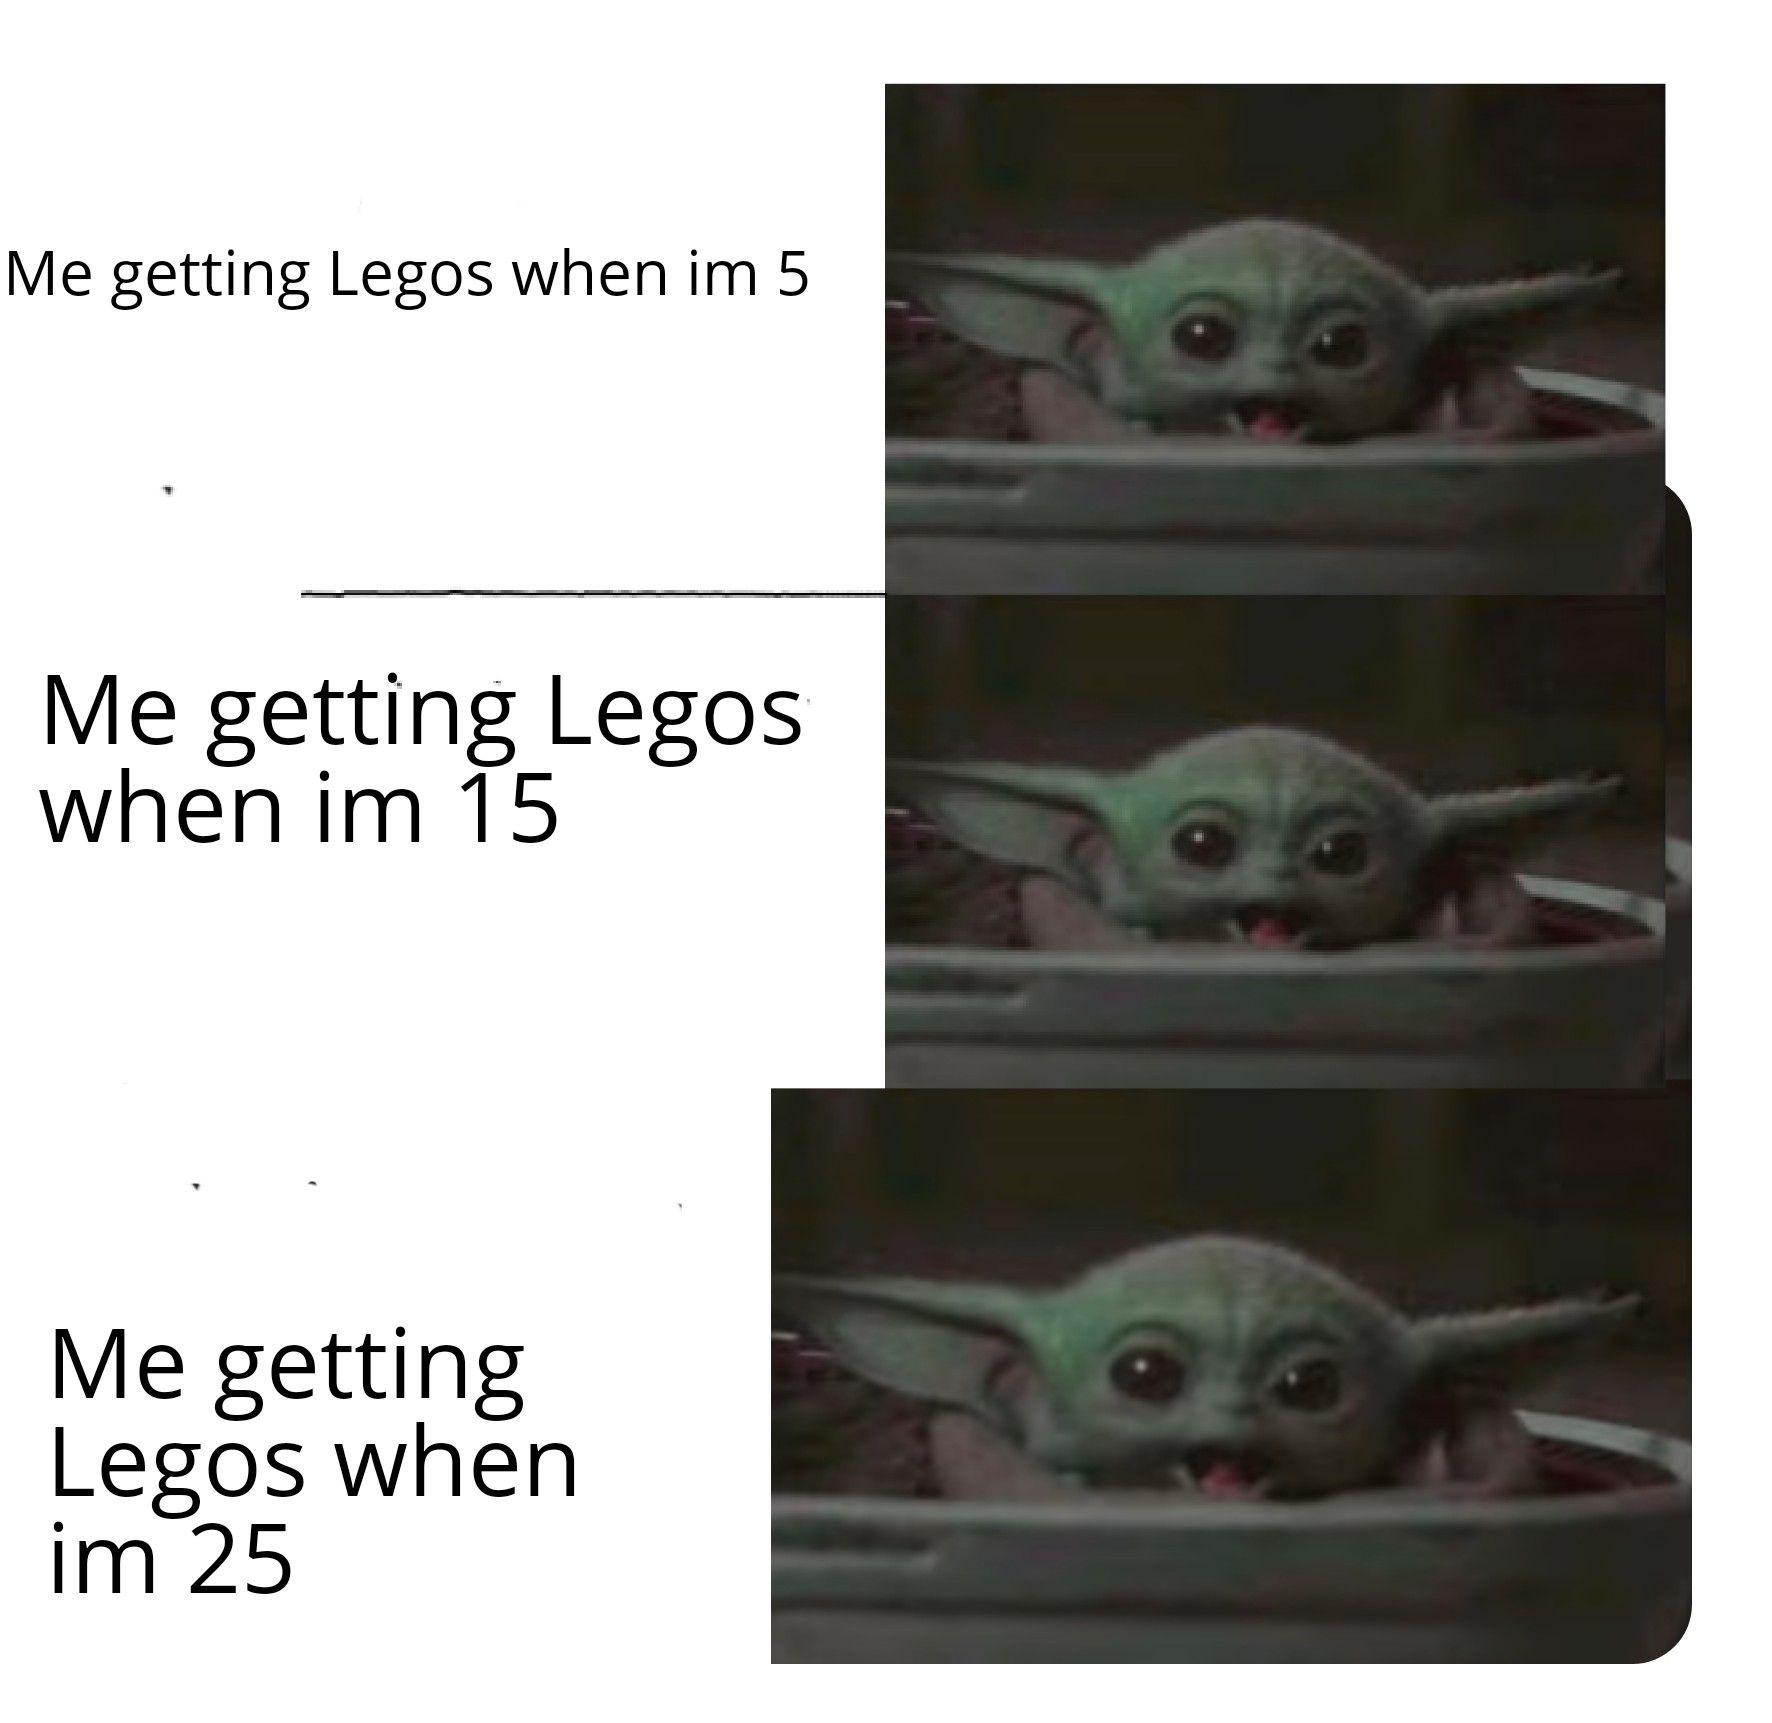 Pin By Hootandscoot On Baby Yoda Star Wars Memes Lego Memes Memes